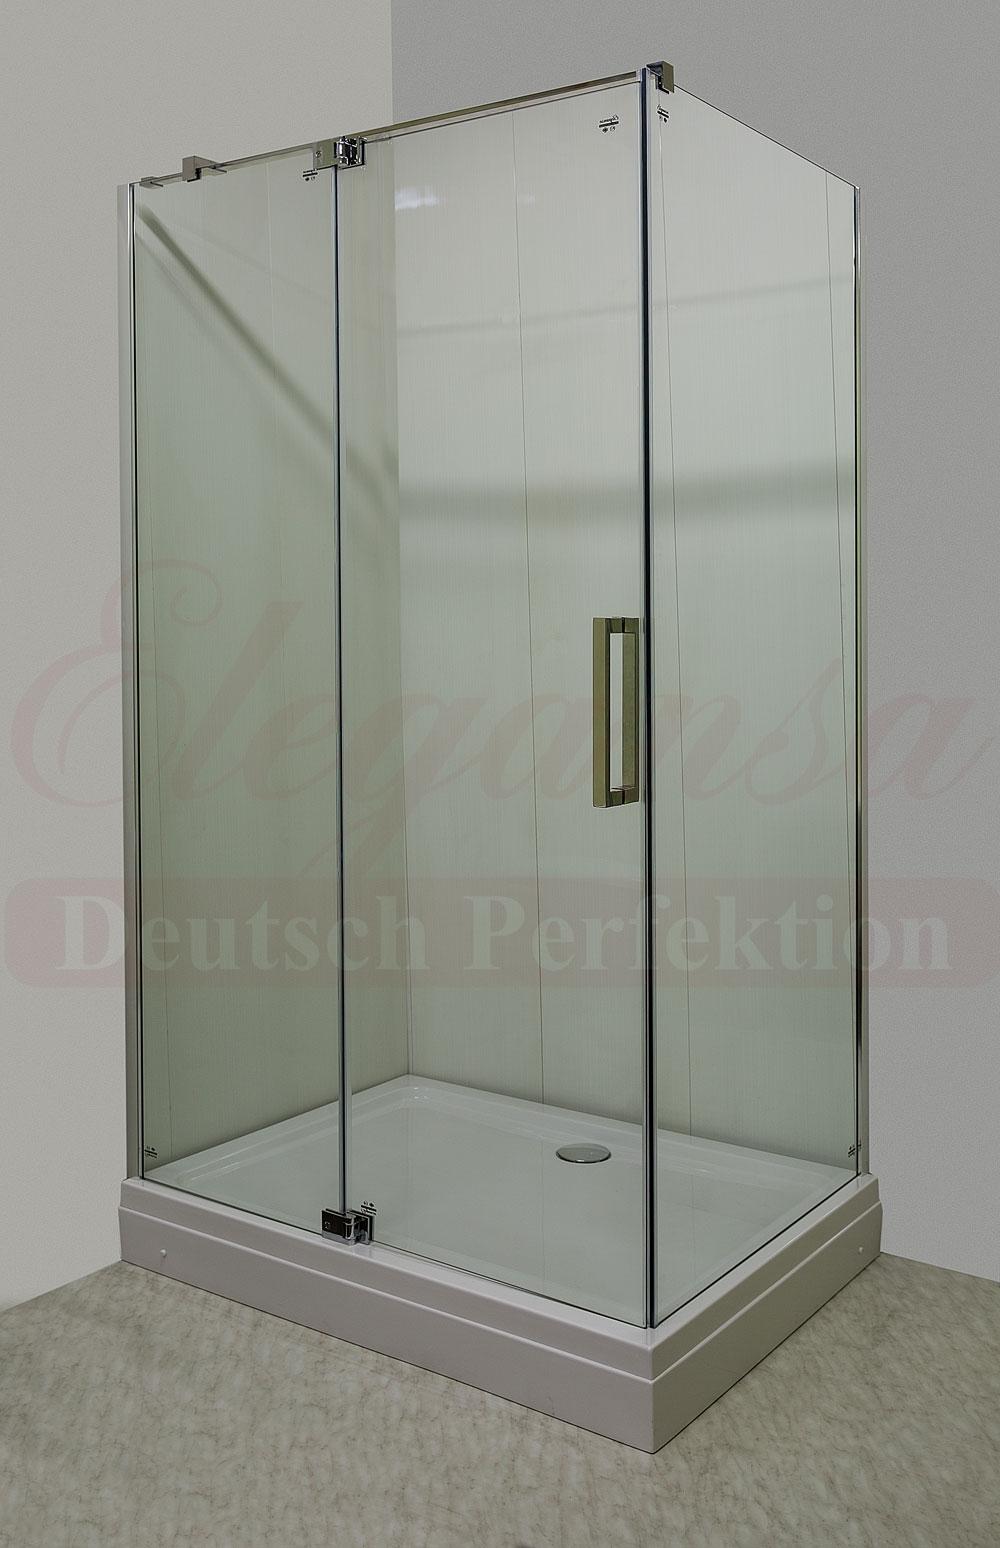 Душевой уголок Elegansa PLATZ TR. 711 90х120х200 см с поддоном